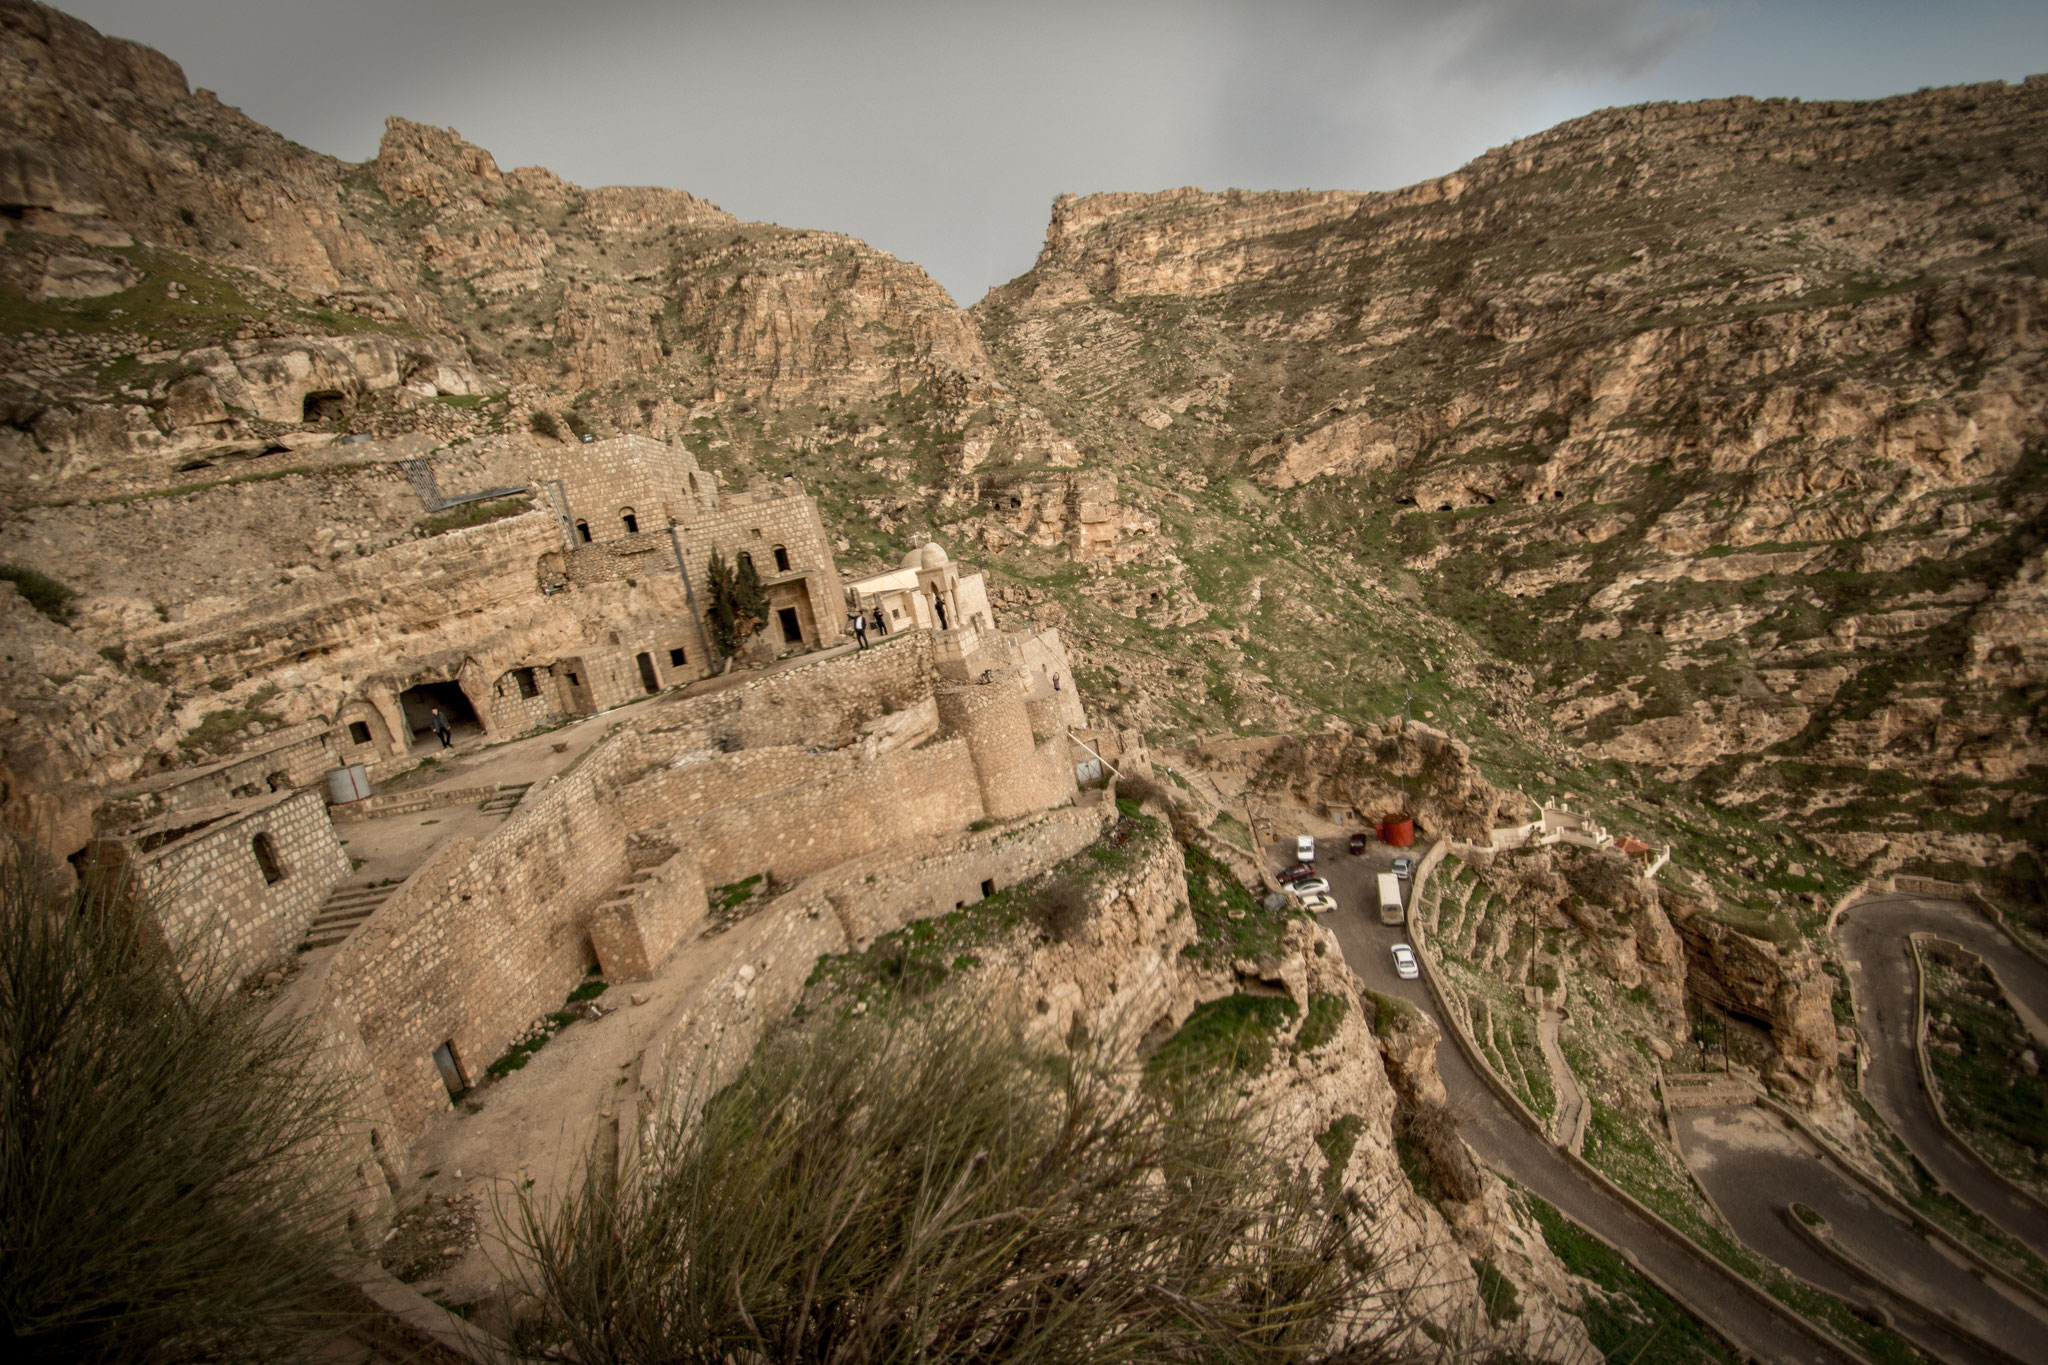 Alqosh monastery. Iraqi Kurdistan. March 2017.